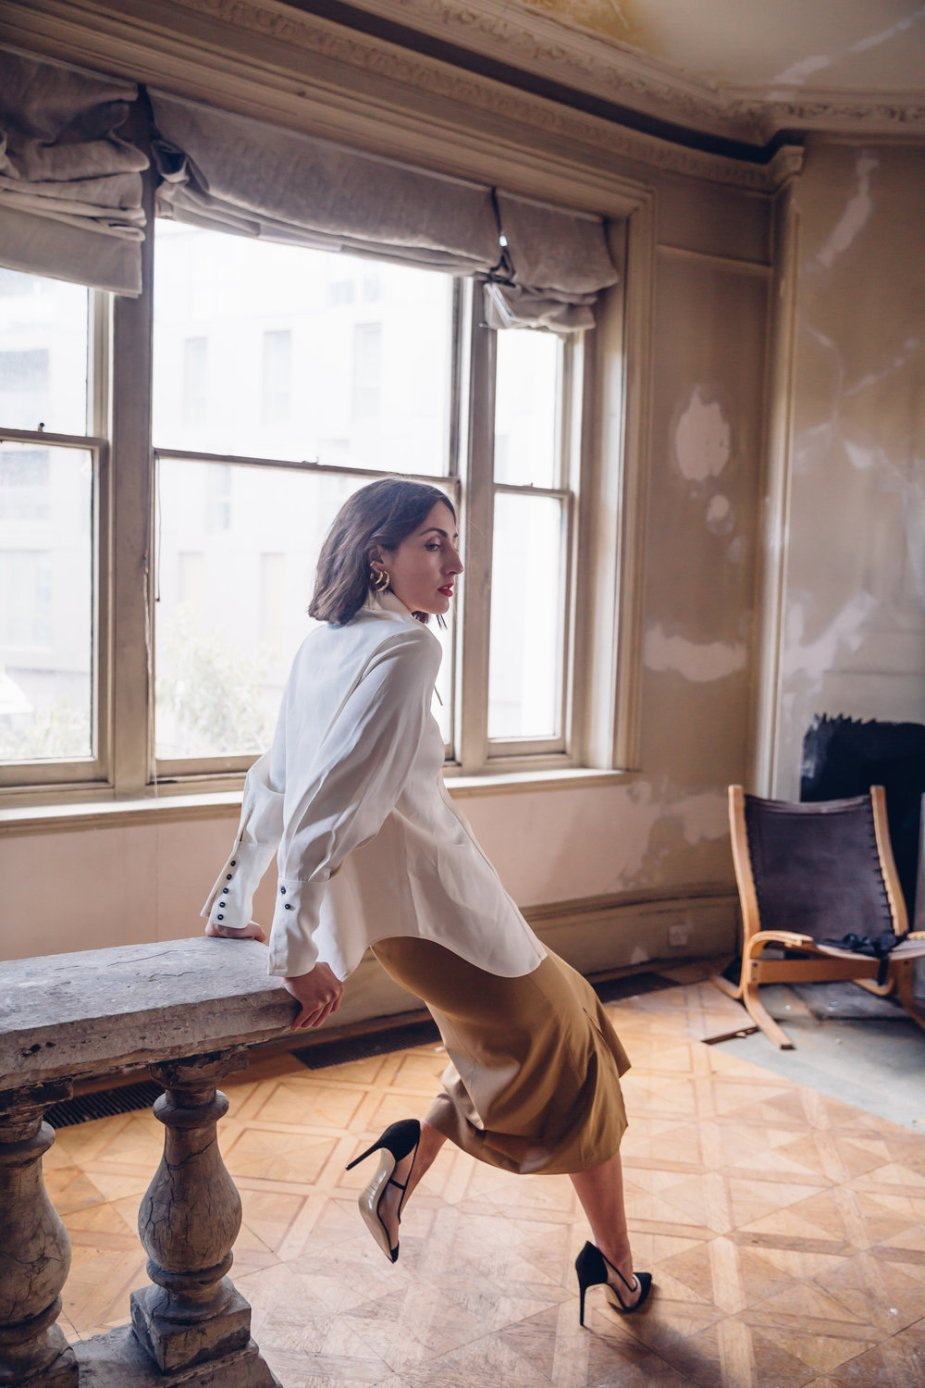 Bionda Castana: The November Collection